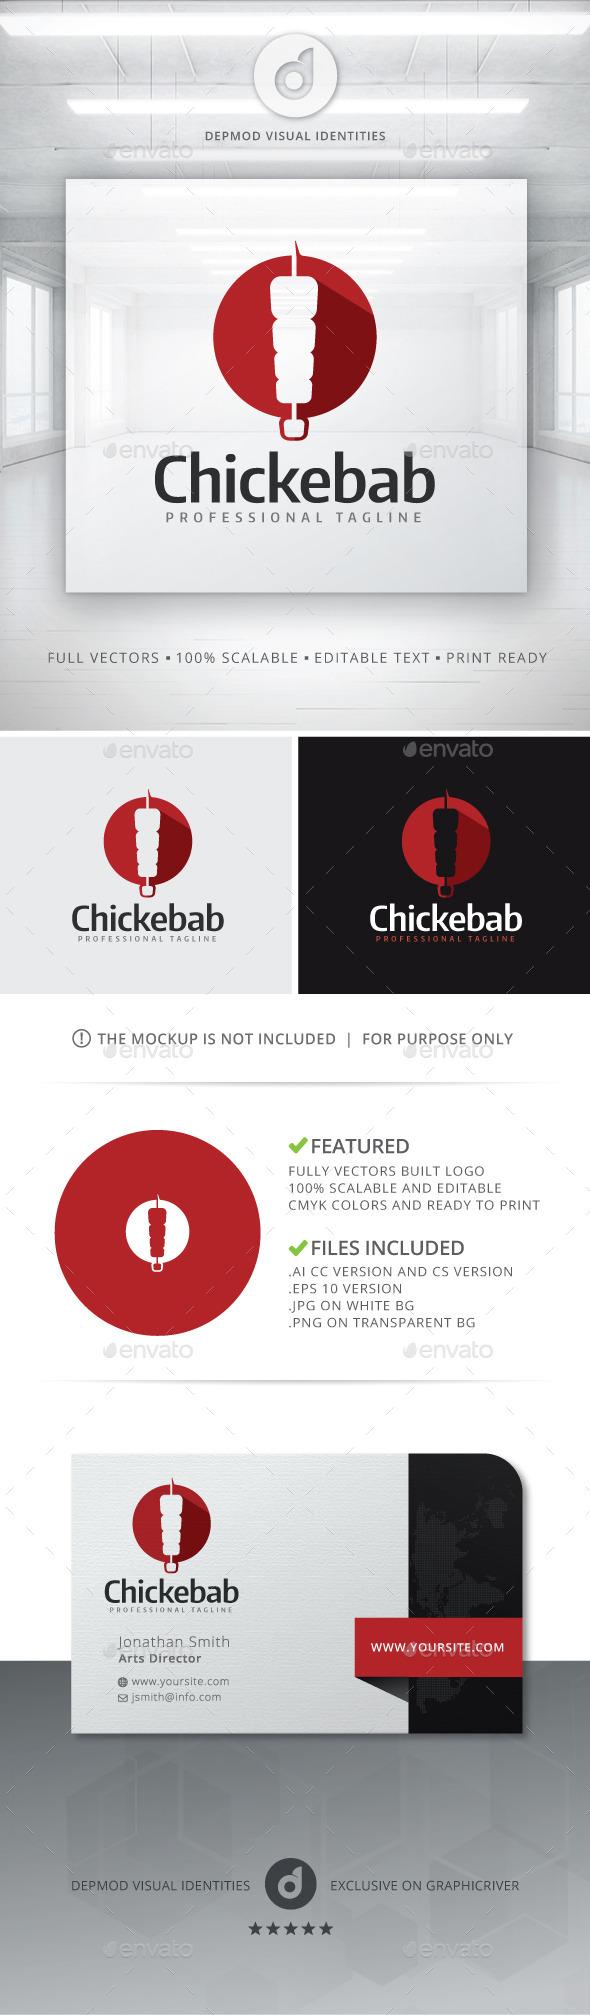 Chickebab Logo